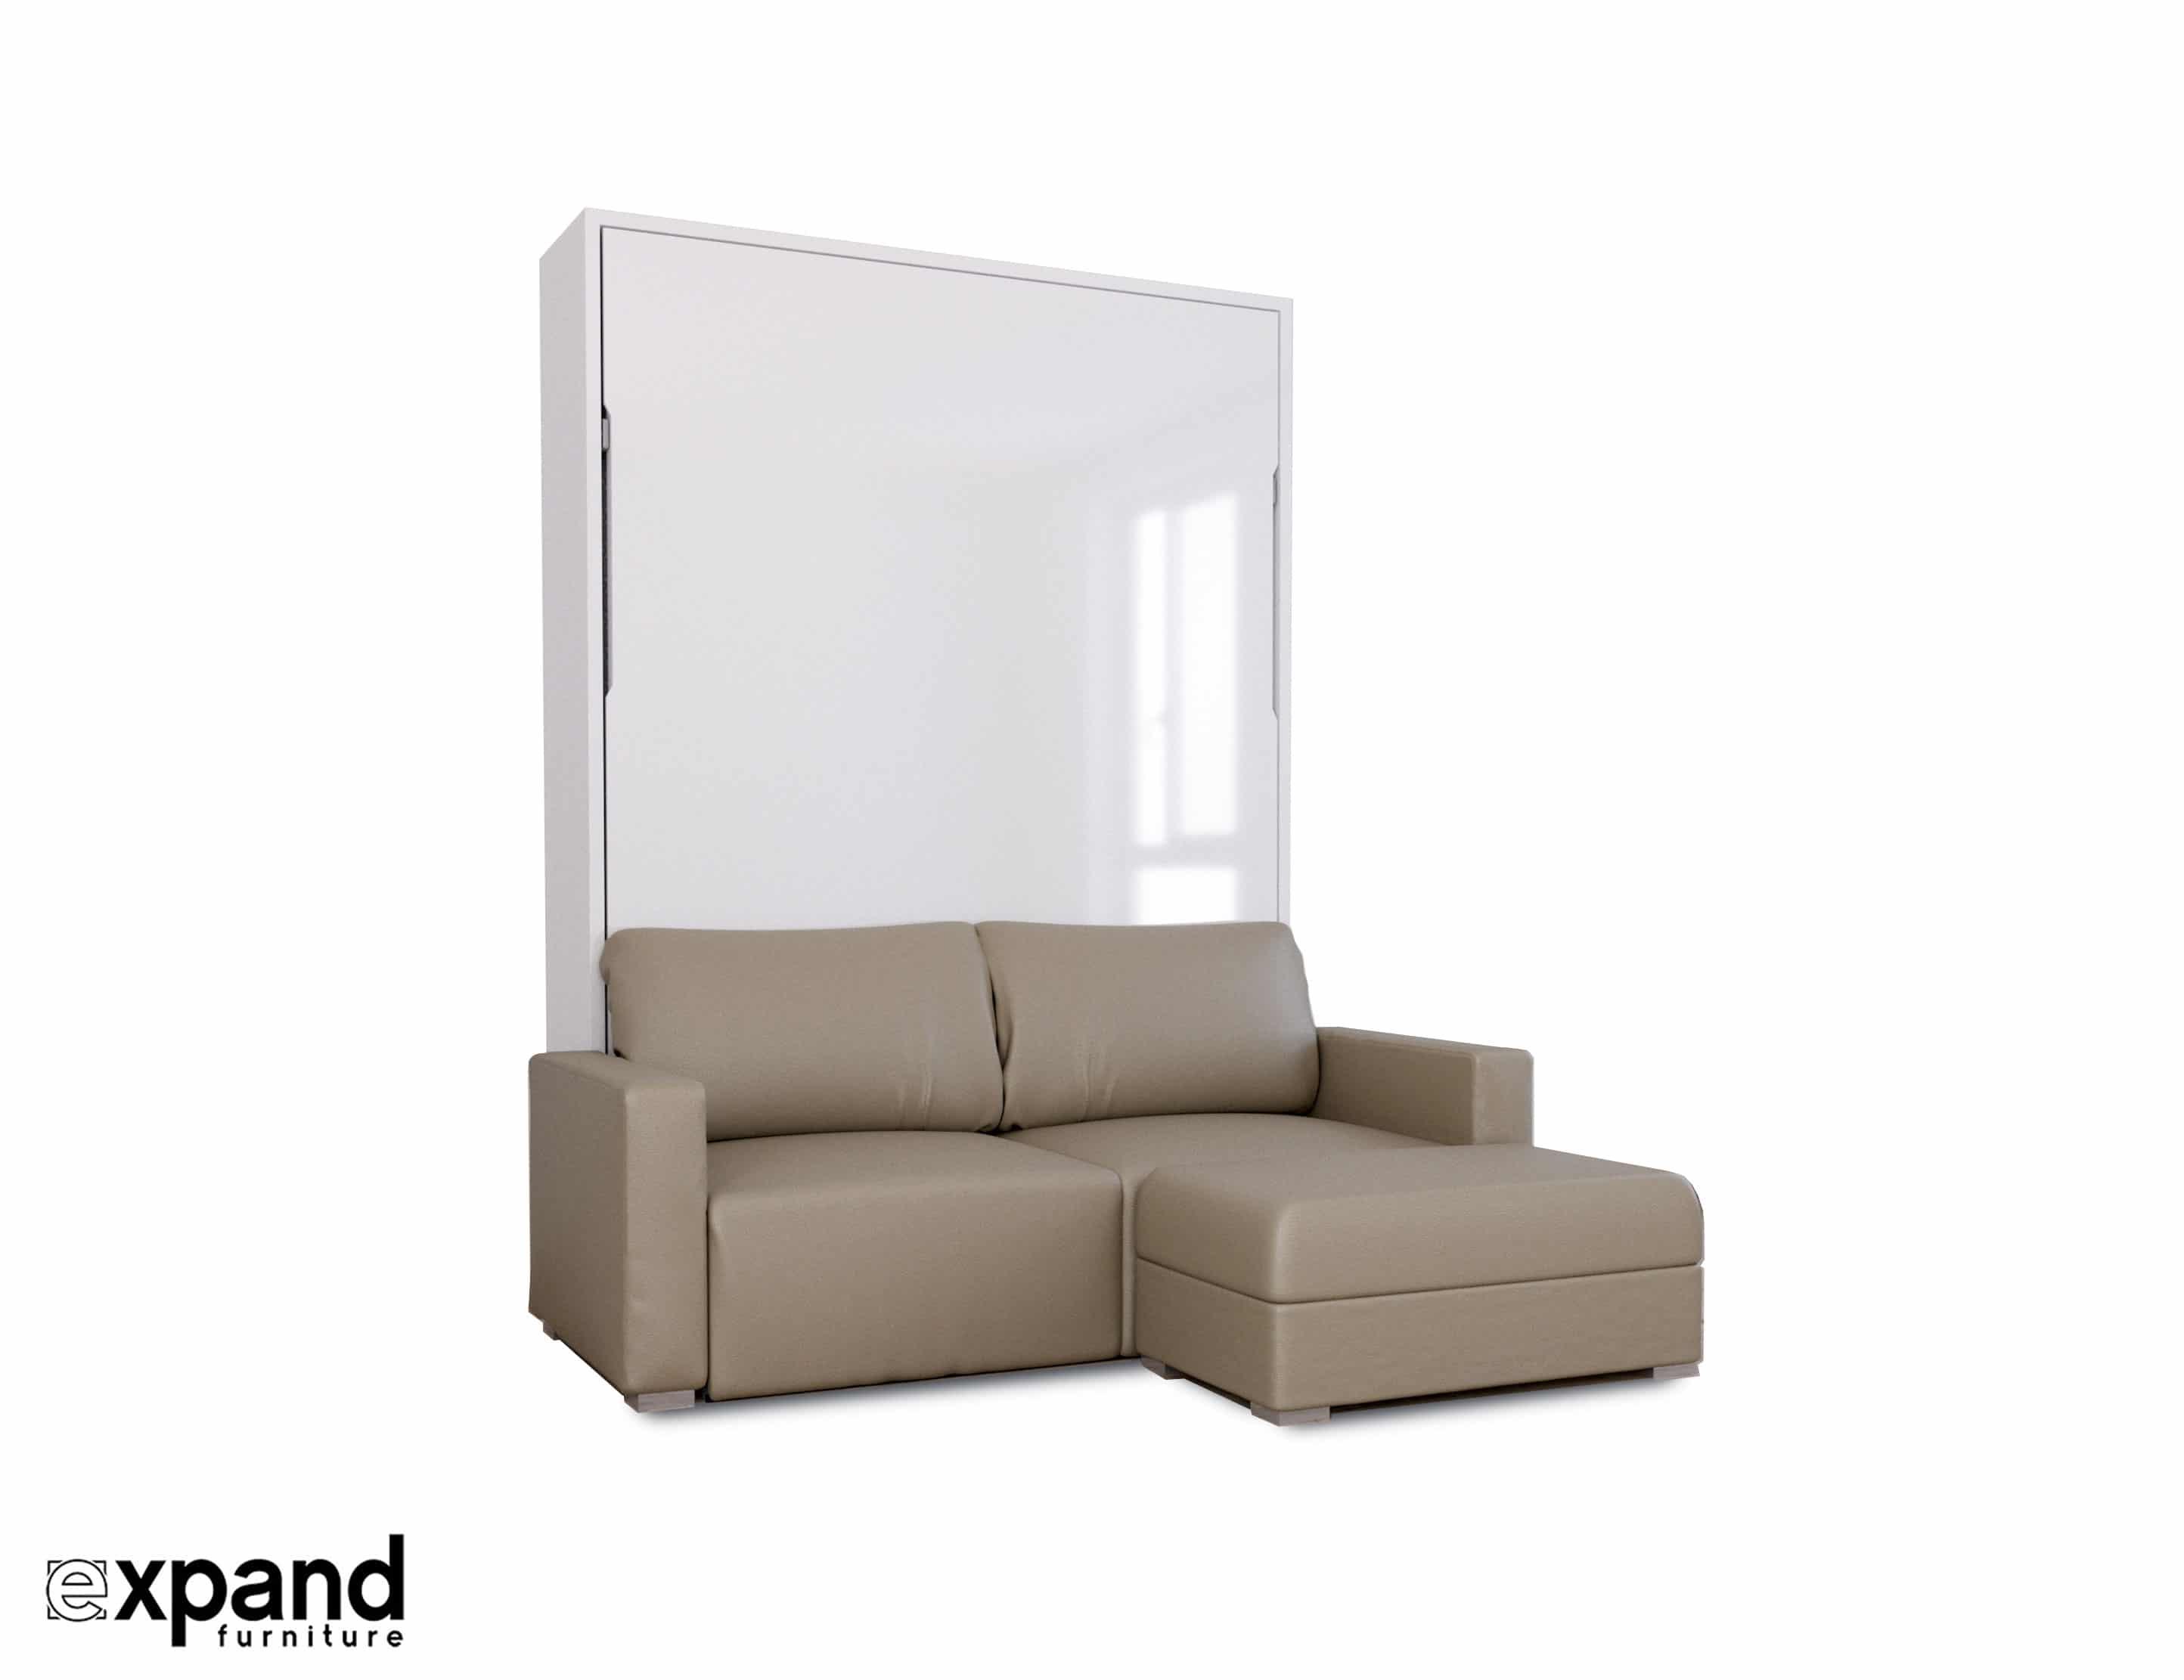 Awe Inspiring Murphysofa Minima Queen In Eco Leather Creativecarmelina Interior Chair Design Creativecarmelinacom